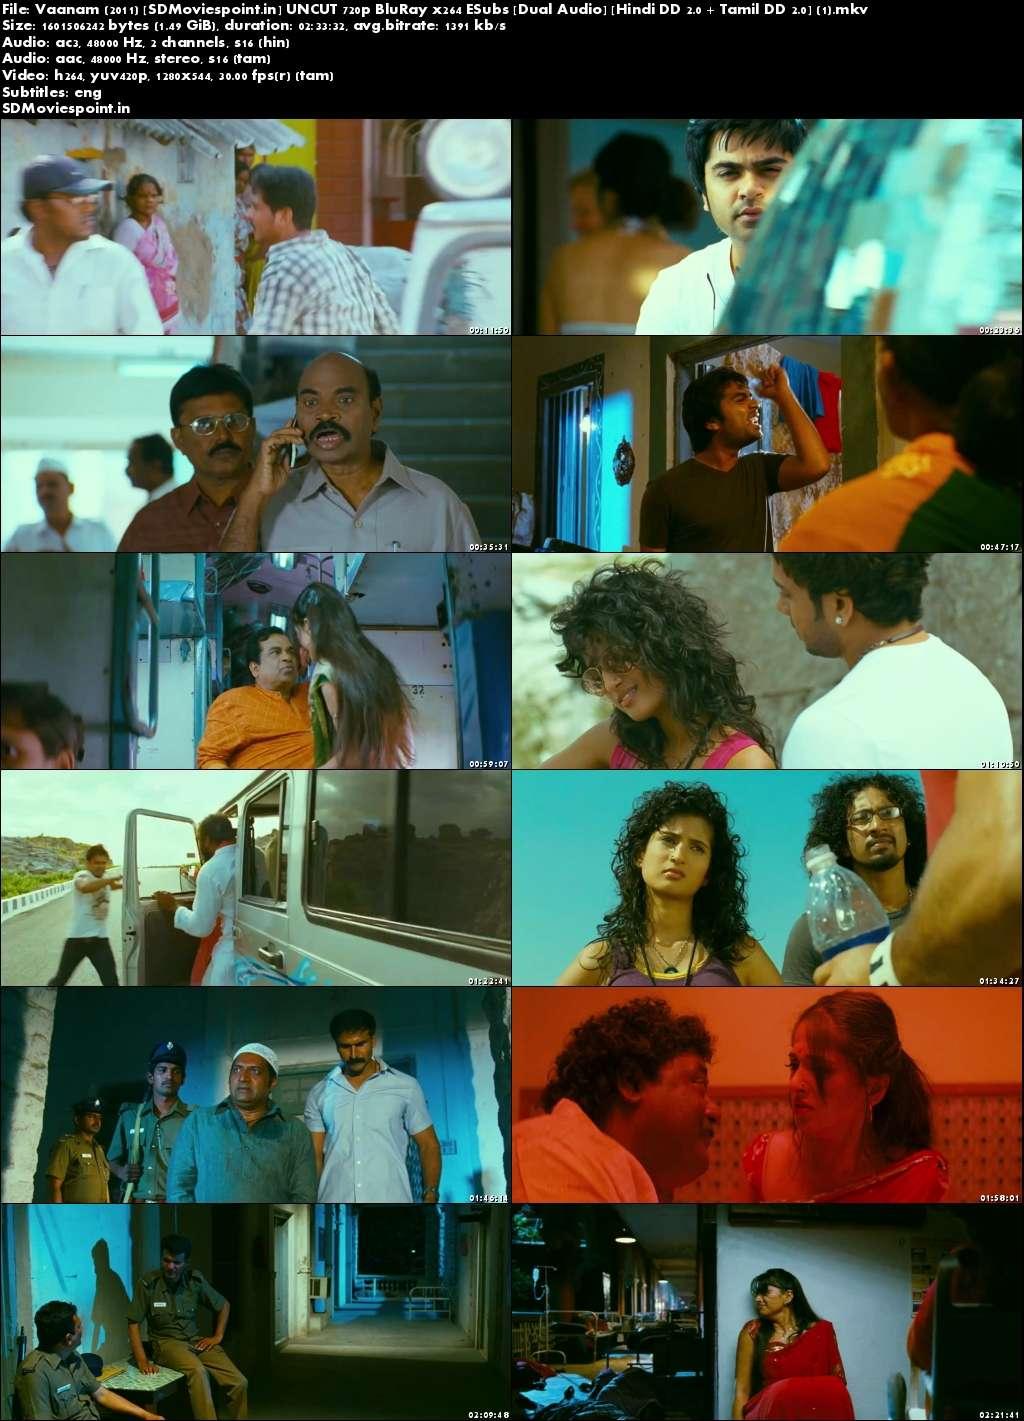 Screen Shots Vaanam 2011 Full Movie Download Dual Audio In Hindi Free 720p